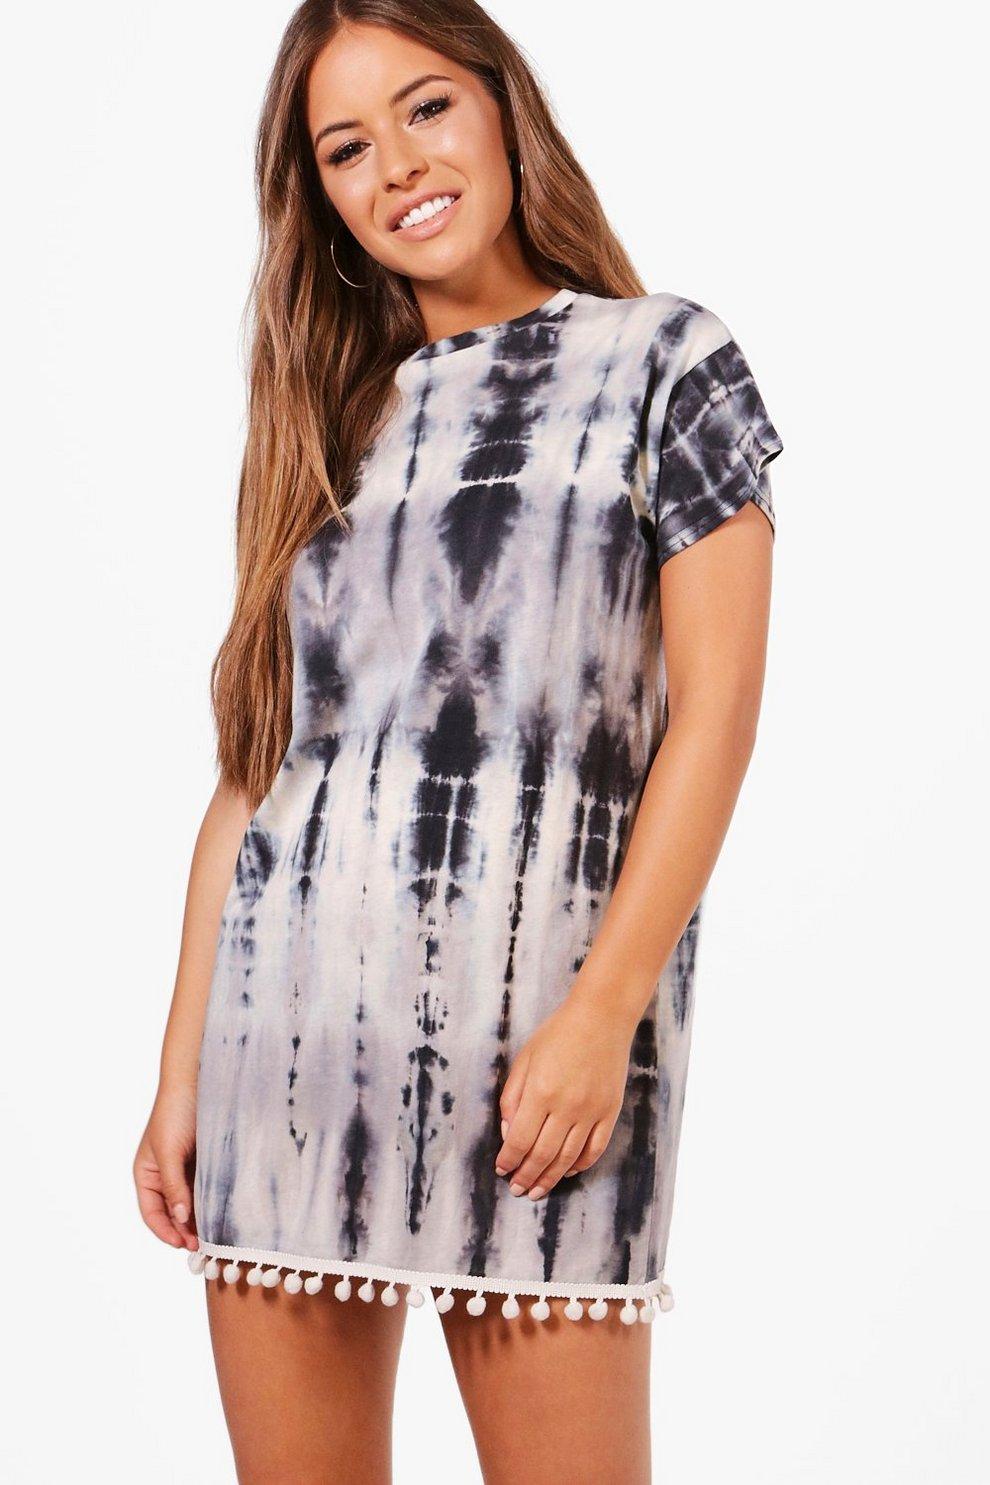 Petite Layla T-Shirt-Kleid in Batik-Optik mit Bömmelchen   Boohoo c0958e7146